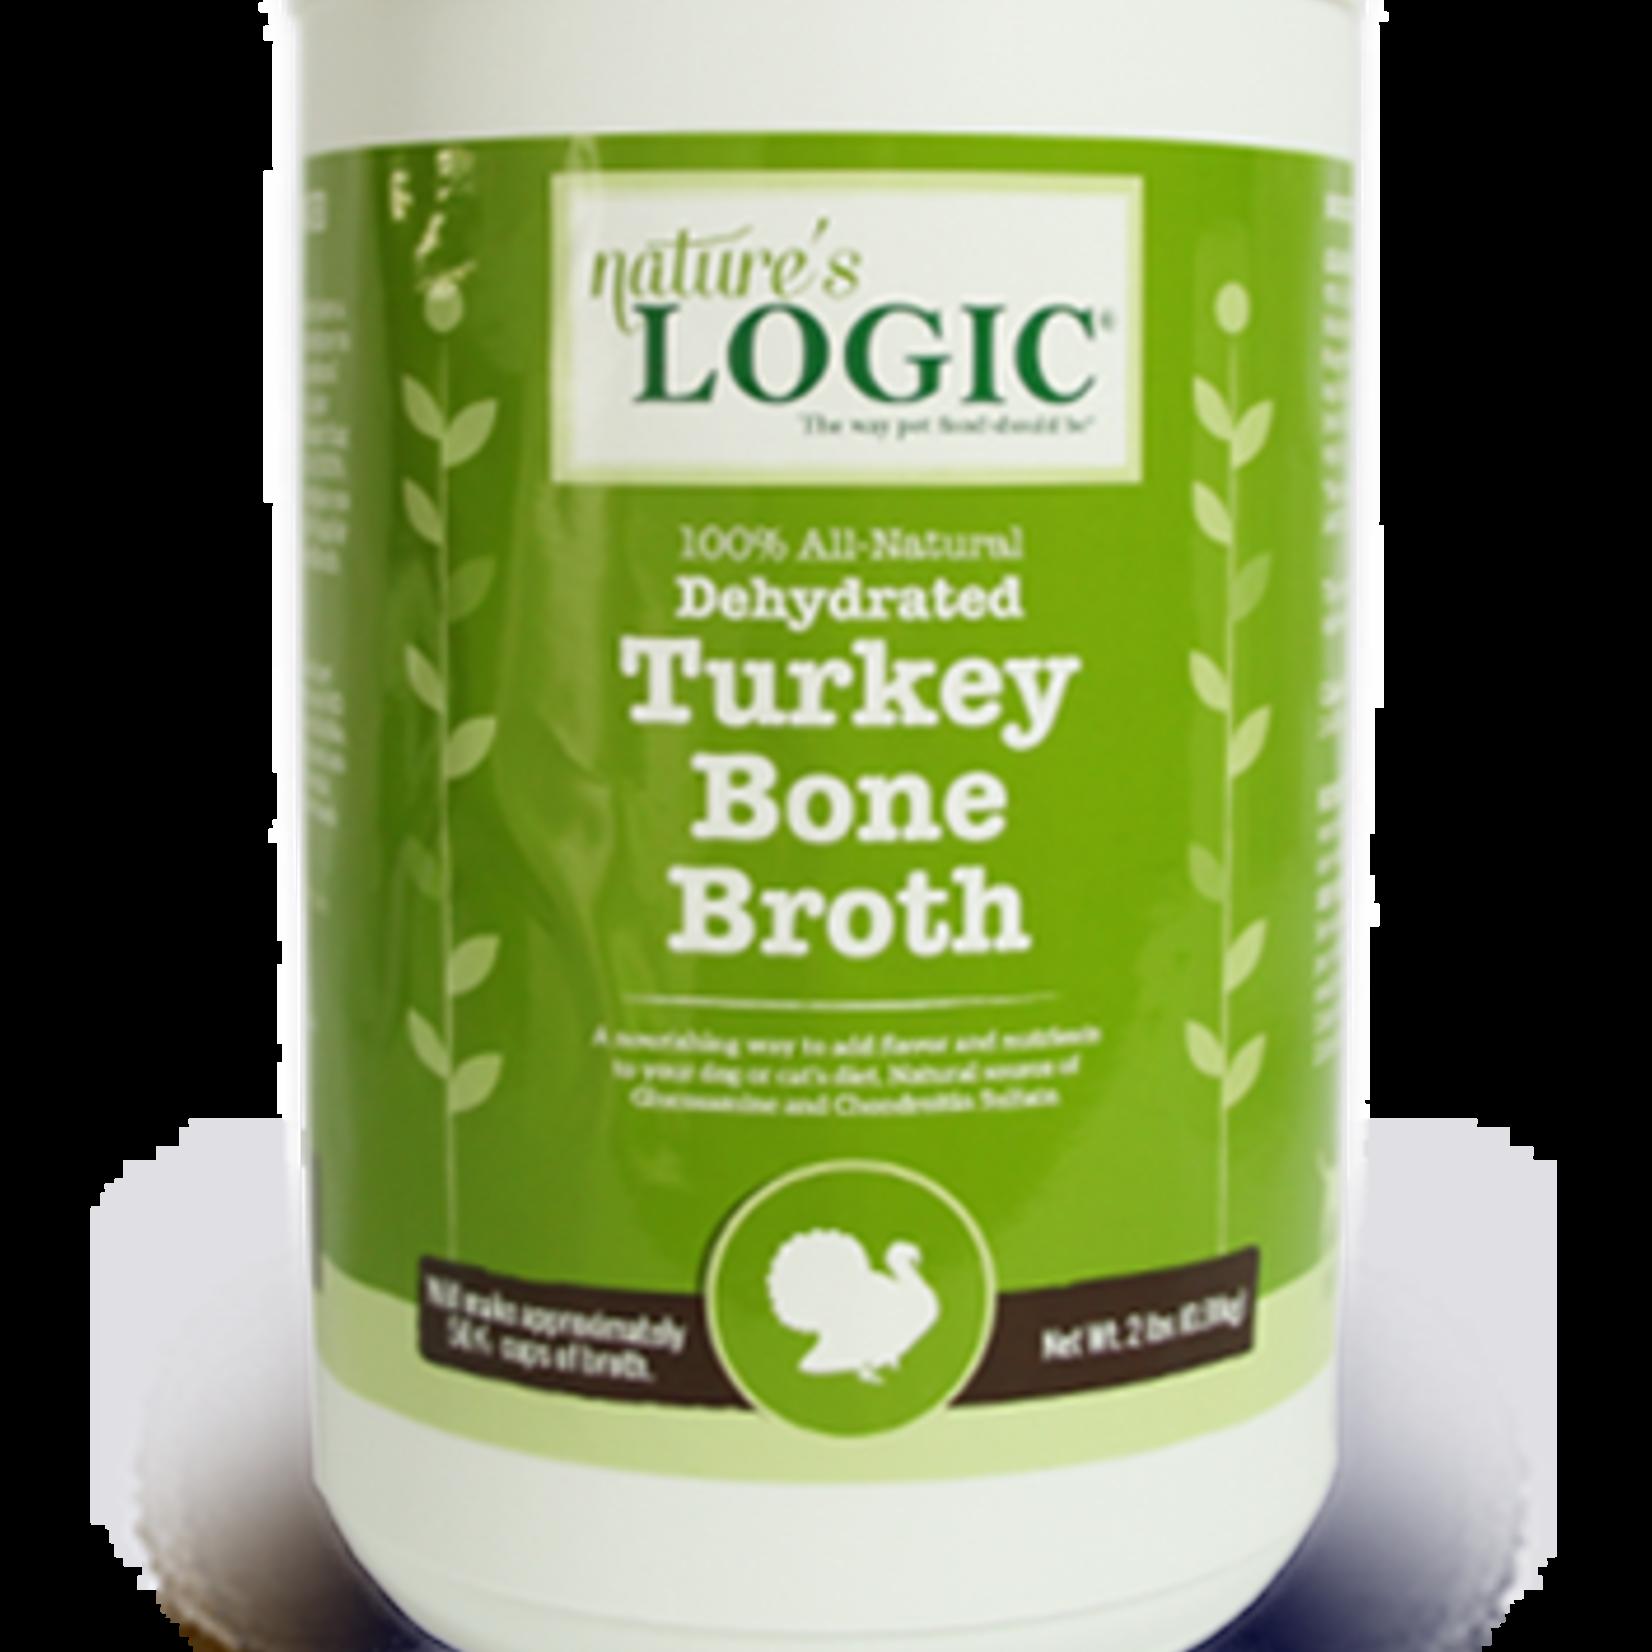 Natures Logic Natures Logic Dehydrated Turkey Bone Broth 6 OZ